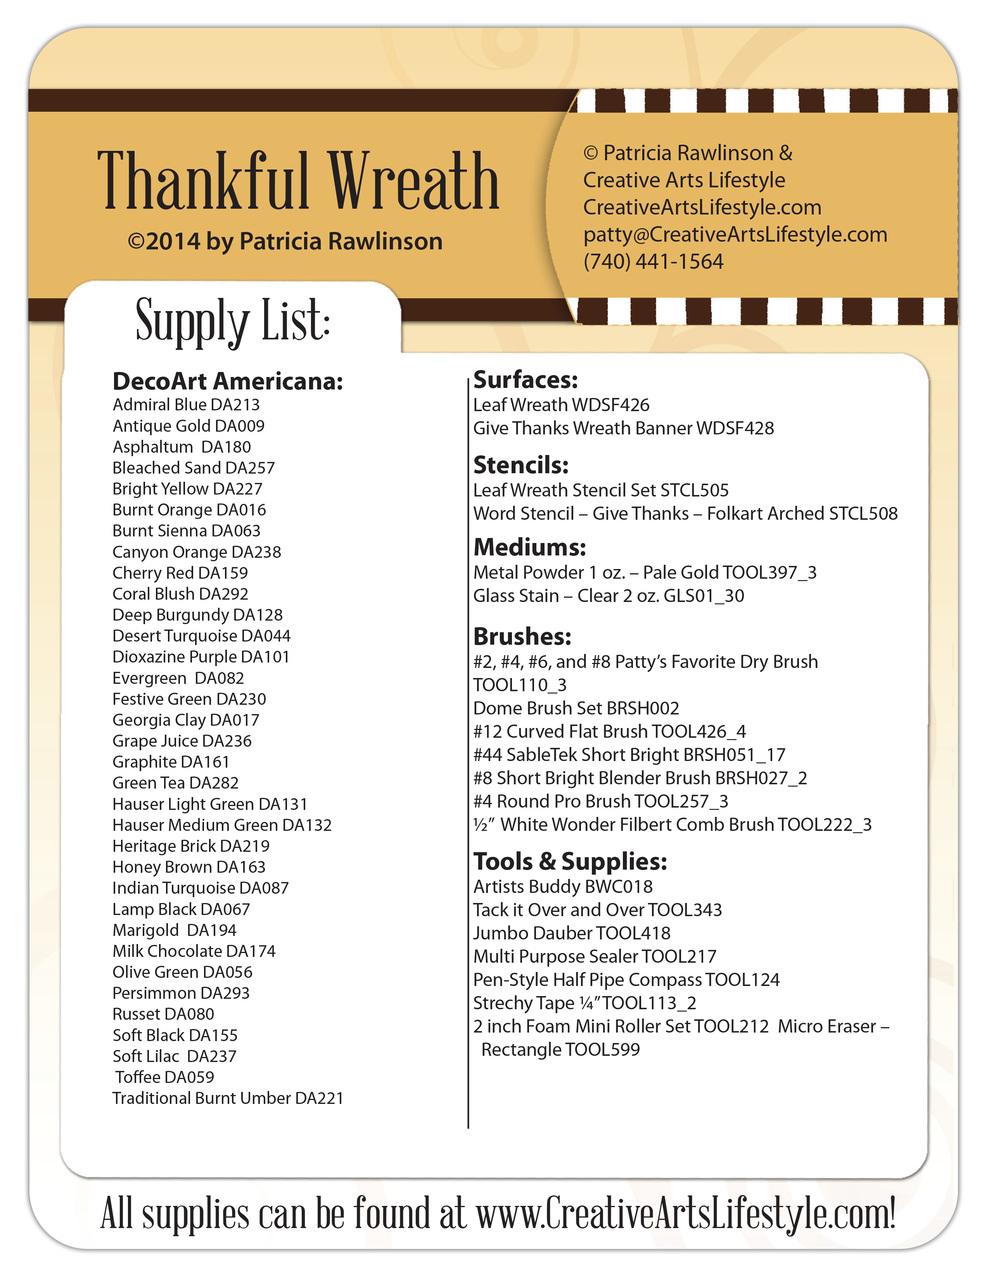 Thankful Wreath DVD & Pattern Packet - Patricia Rawlinson